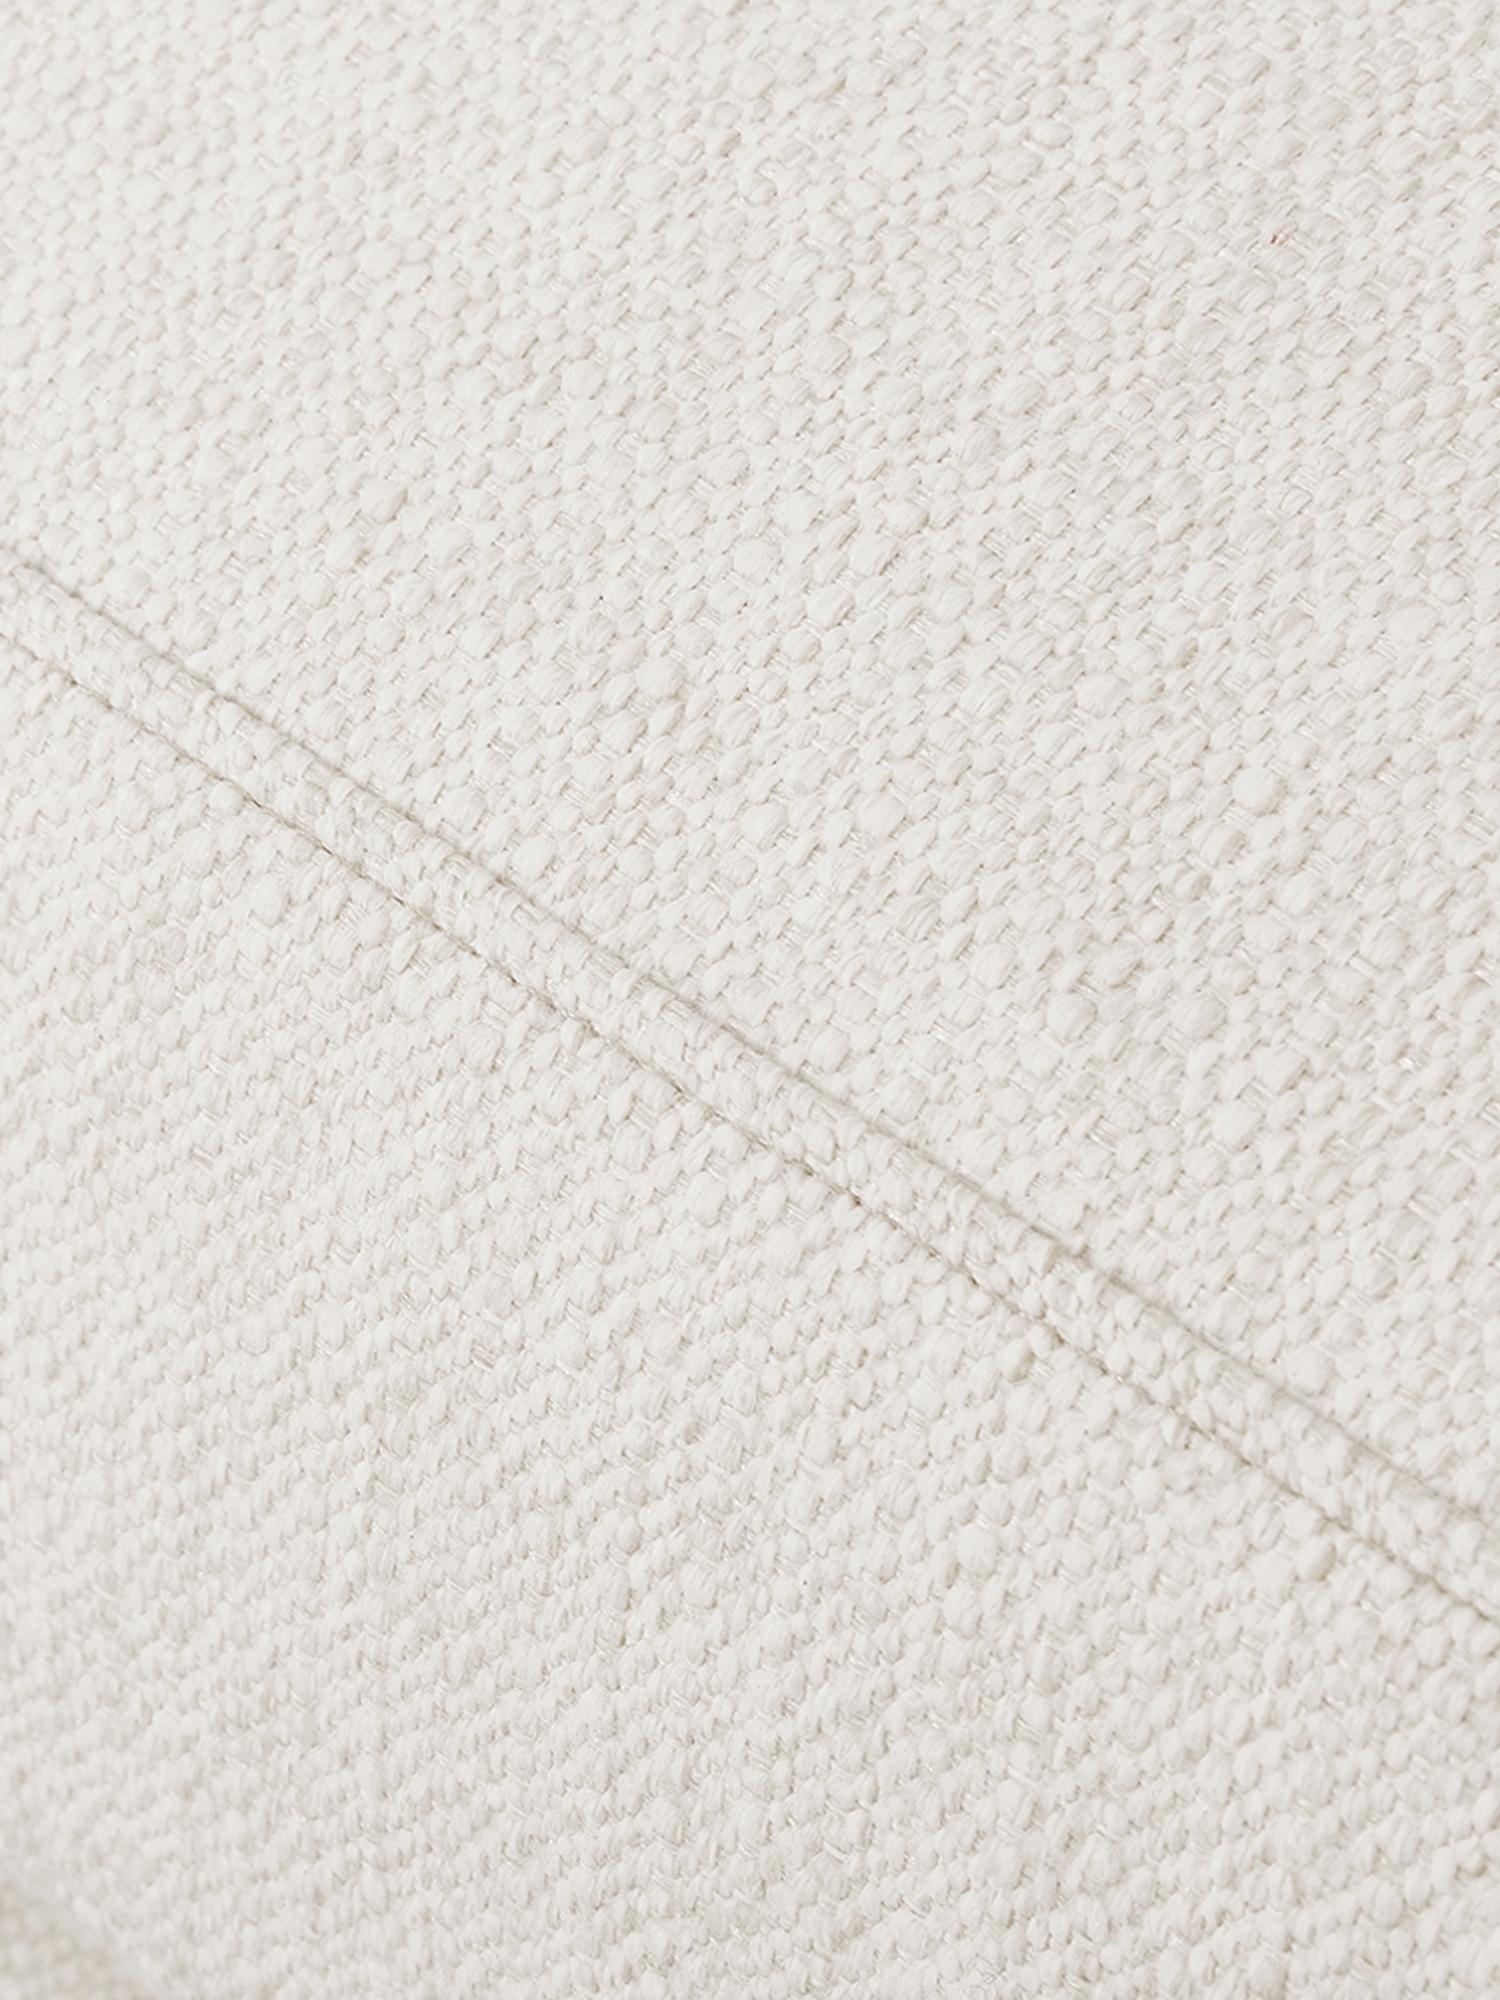 Sofa Tribeca (3-Sitzer), Bezug: Polyester Der hochwertige, Gestell: Massives Kiefernholz, Füße: Massives Buchenholz, lack, Webstoff Beige, B 228 x T 104 cm